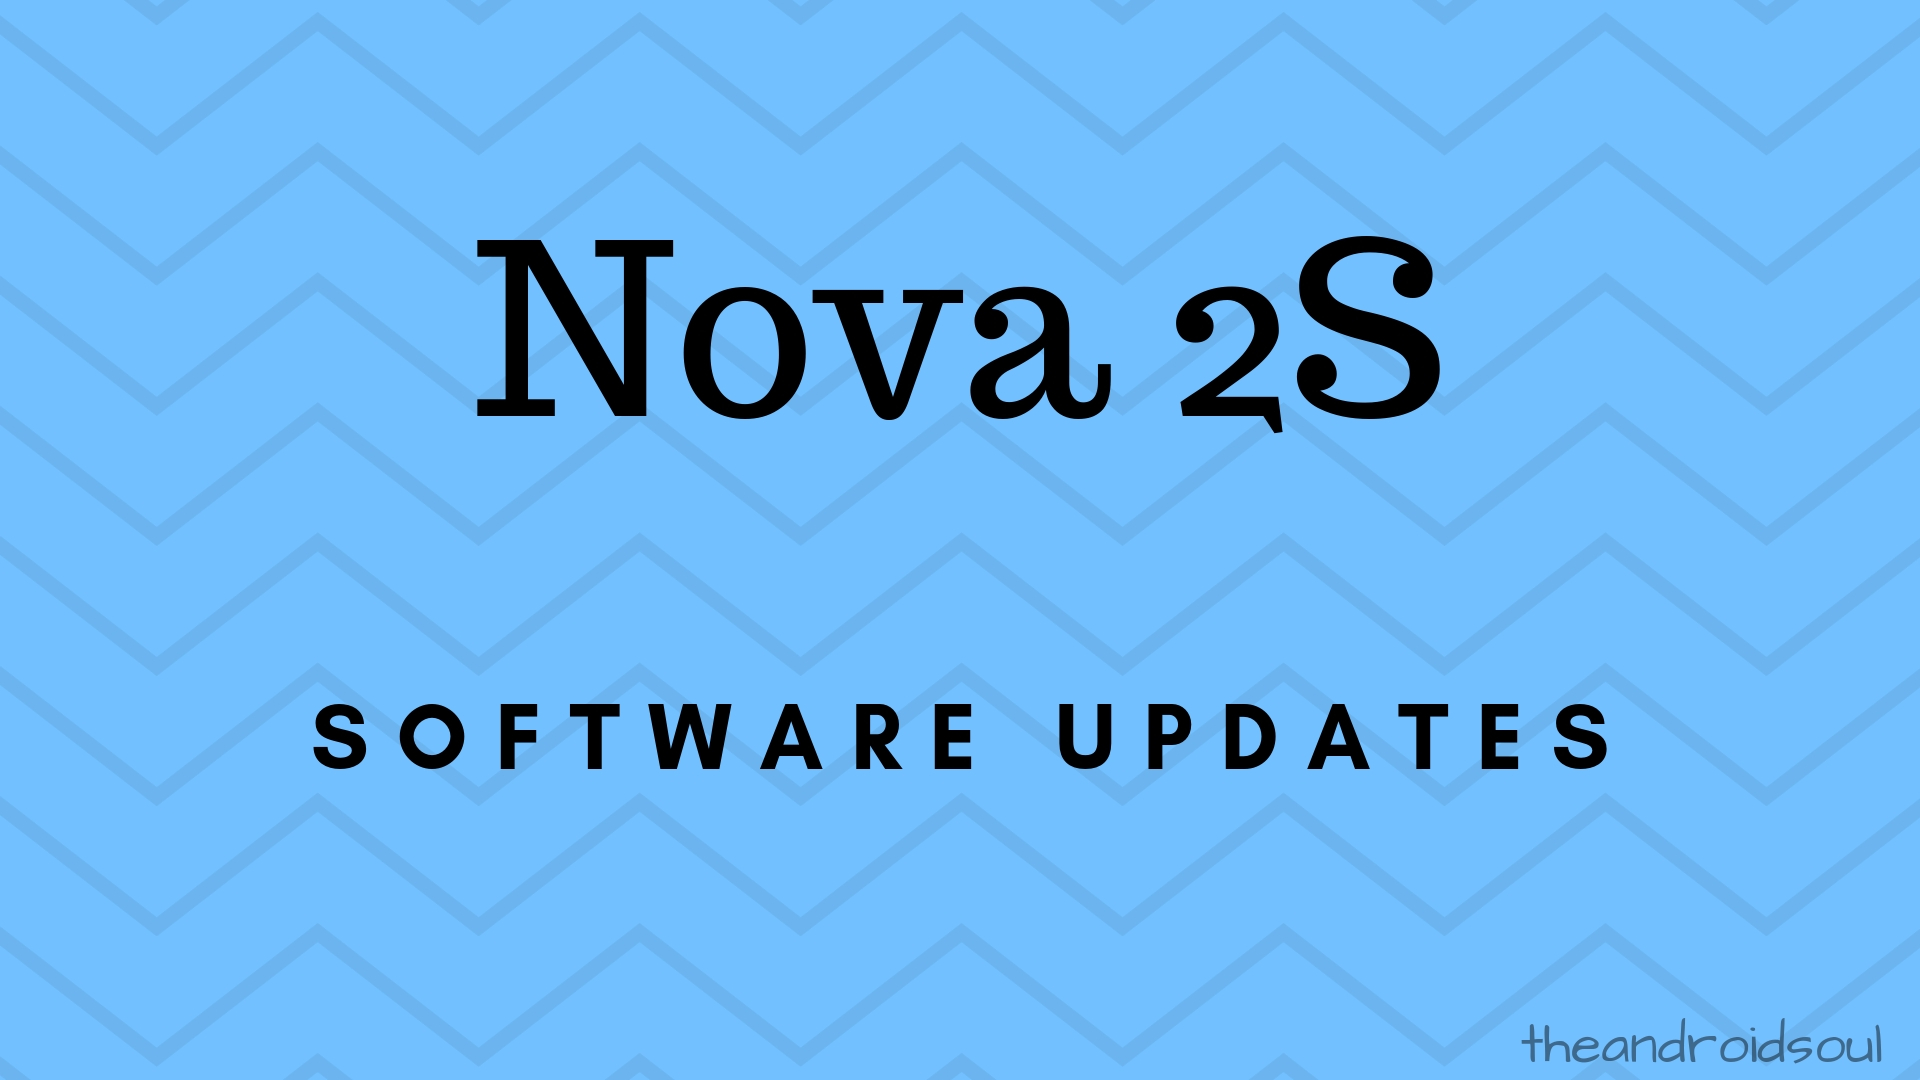 Huawei Nova 2S software updates